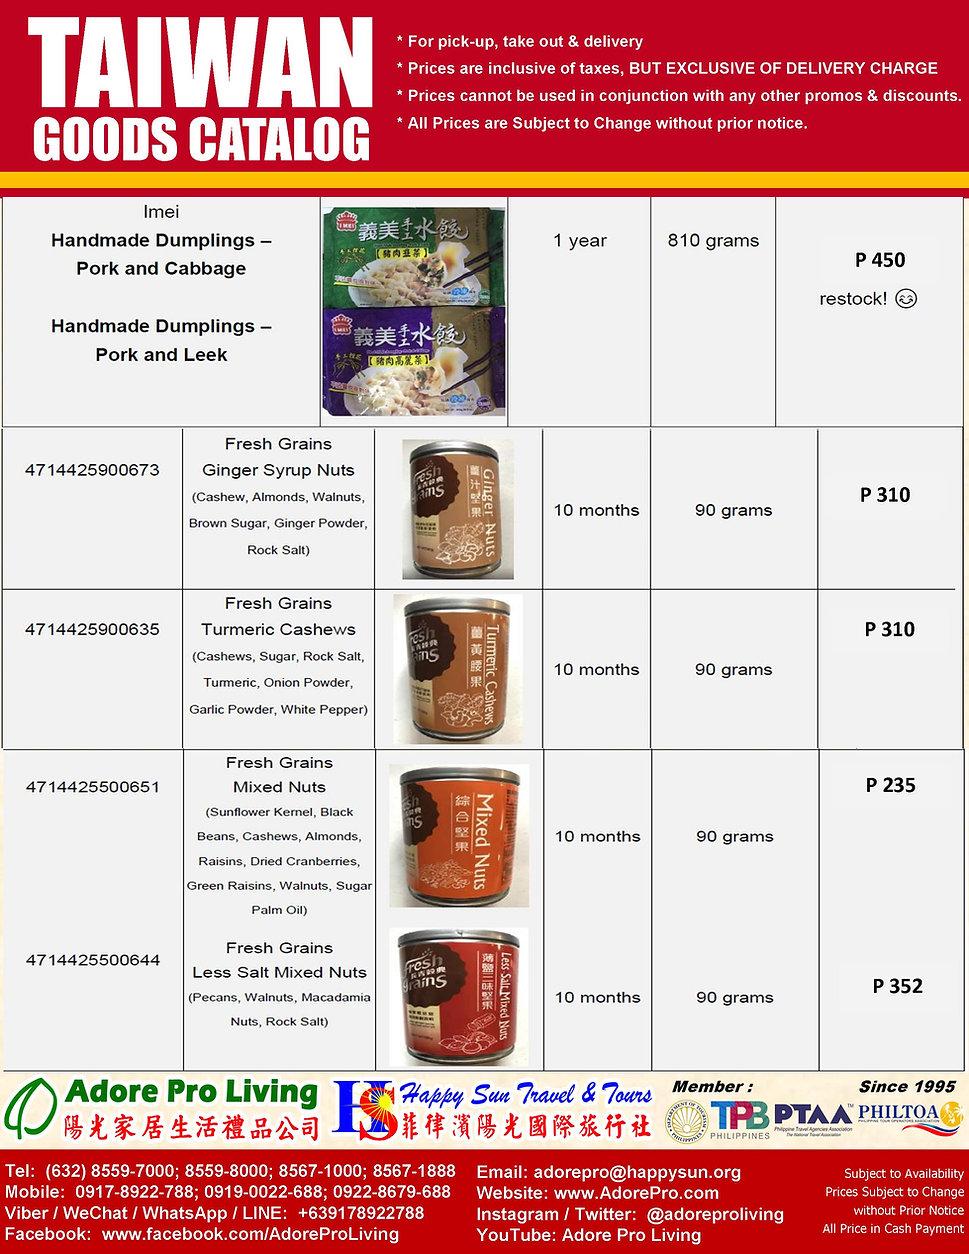 P24_Taiwan Goods Catalog_20200929.jpg